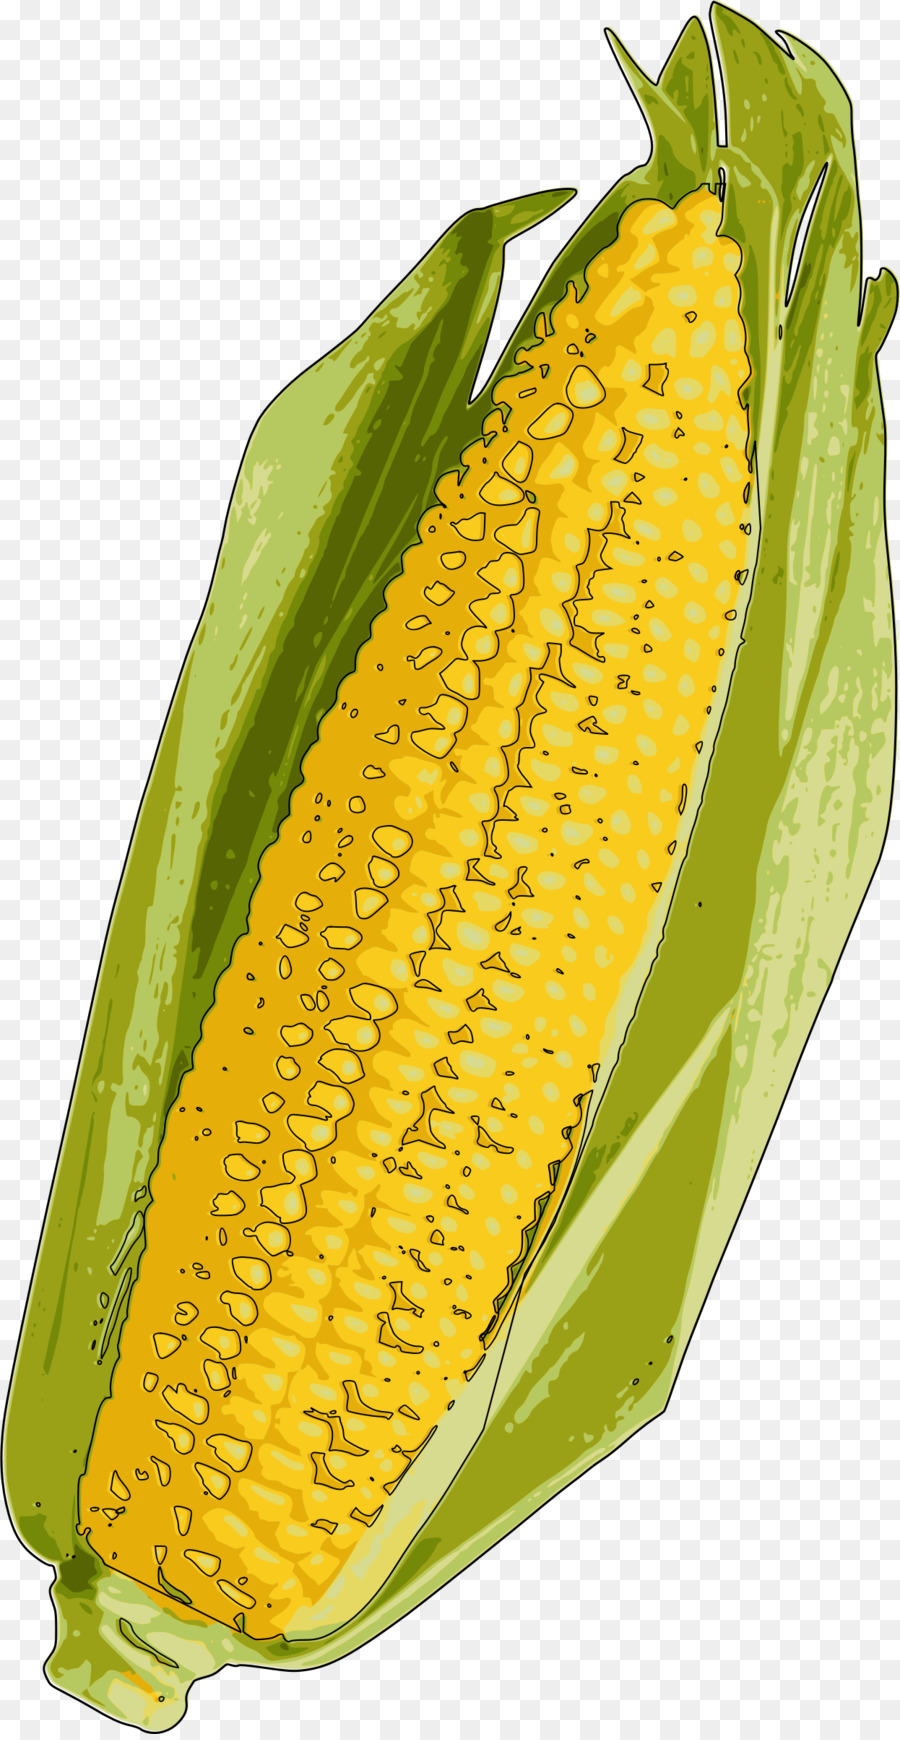 corn on the cob clipart Corn on the cob Vegetarian cuisine Clip art